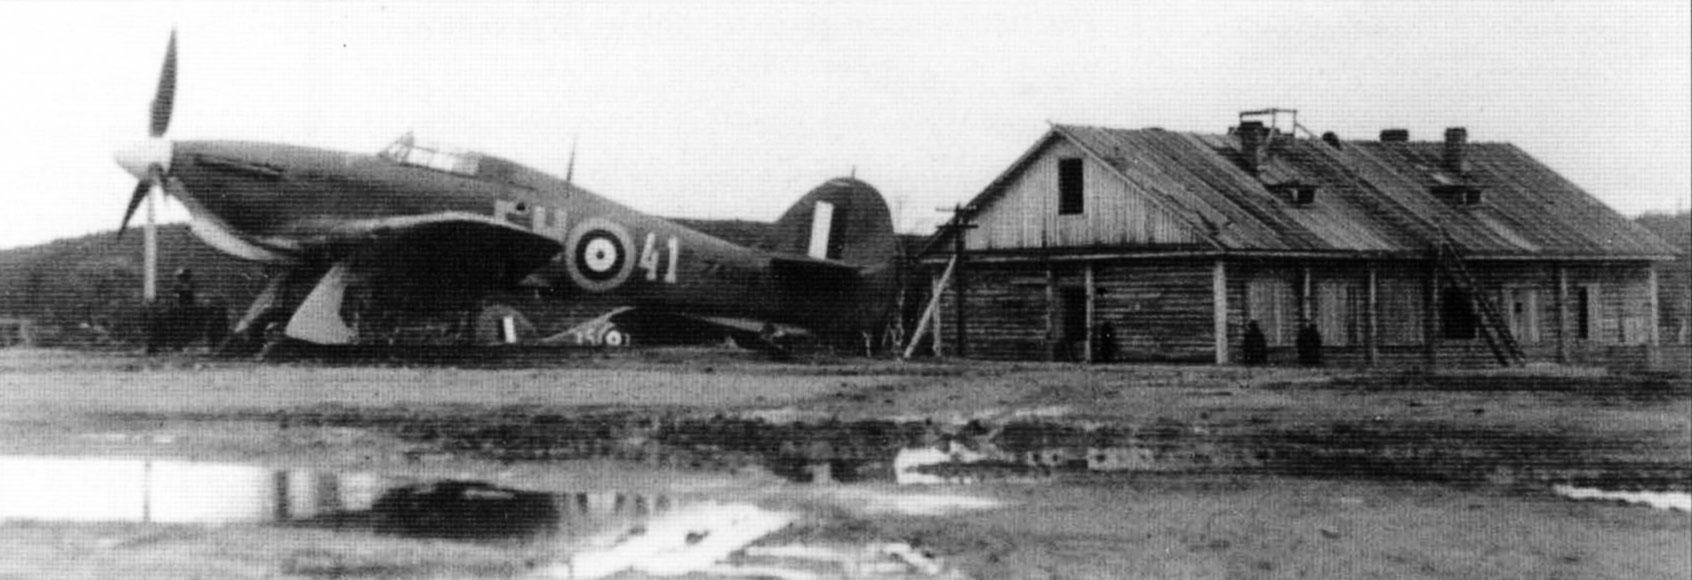 Hurricane IIb RAF 151 Wing 81Sqn FH41 Z4018 Vaenga airfield 02